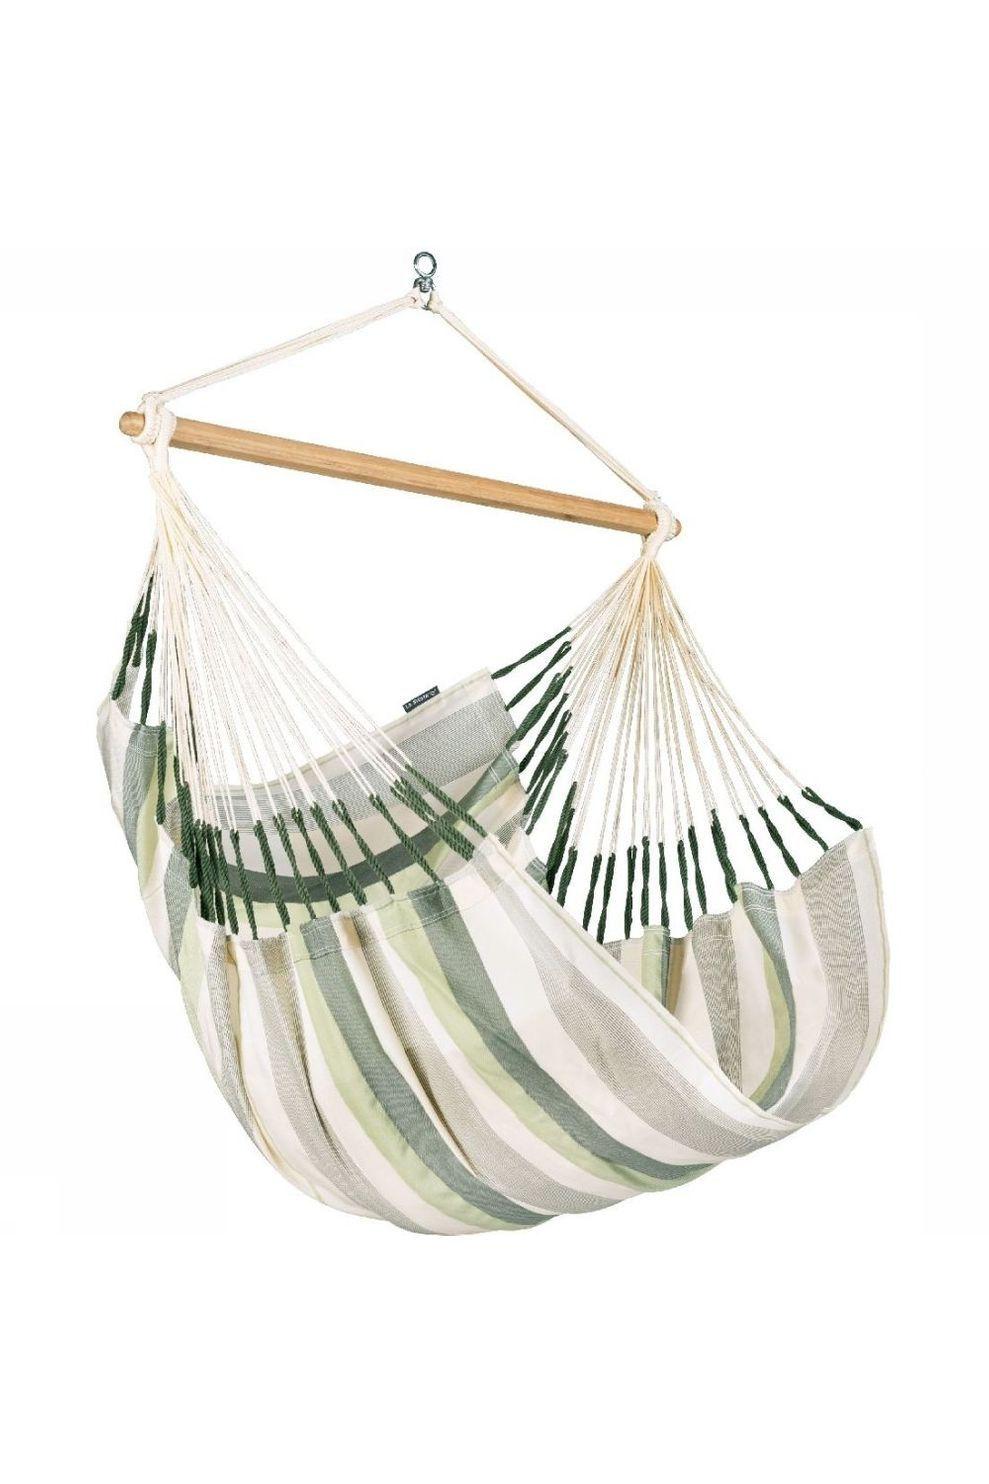 La Siesta Hangmat Domingo Hammock Chair - Groen/ Gemengd